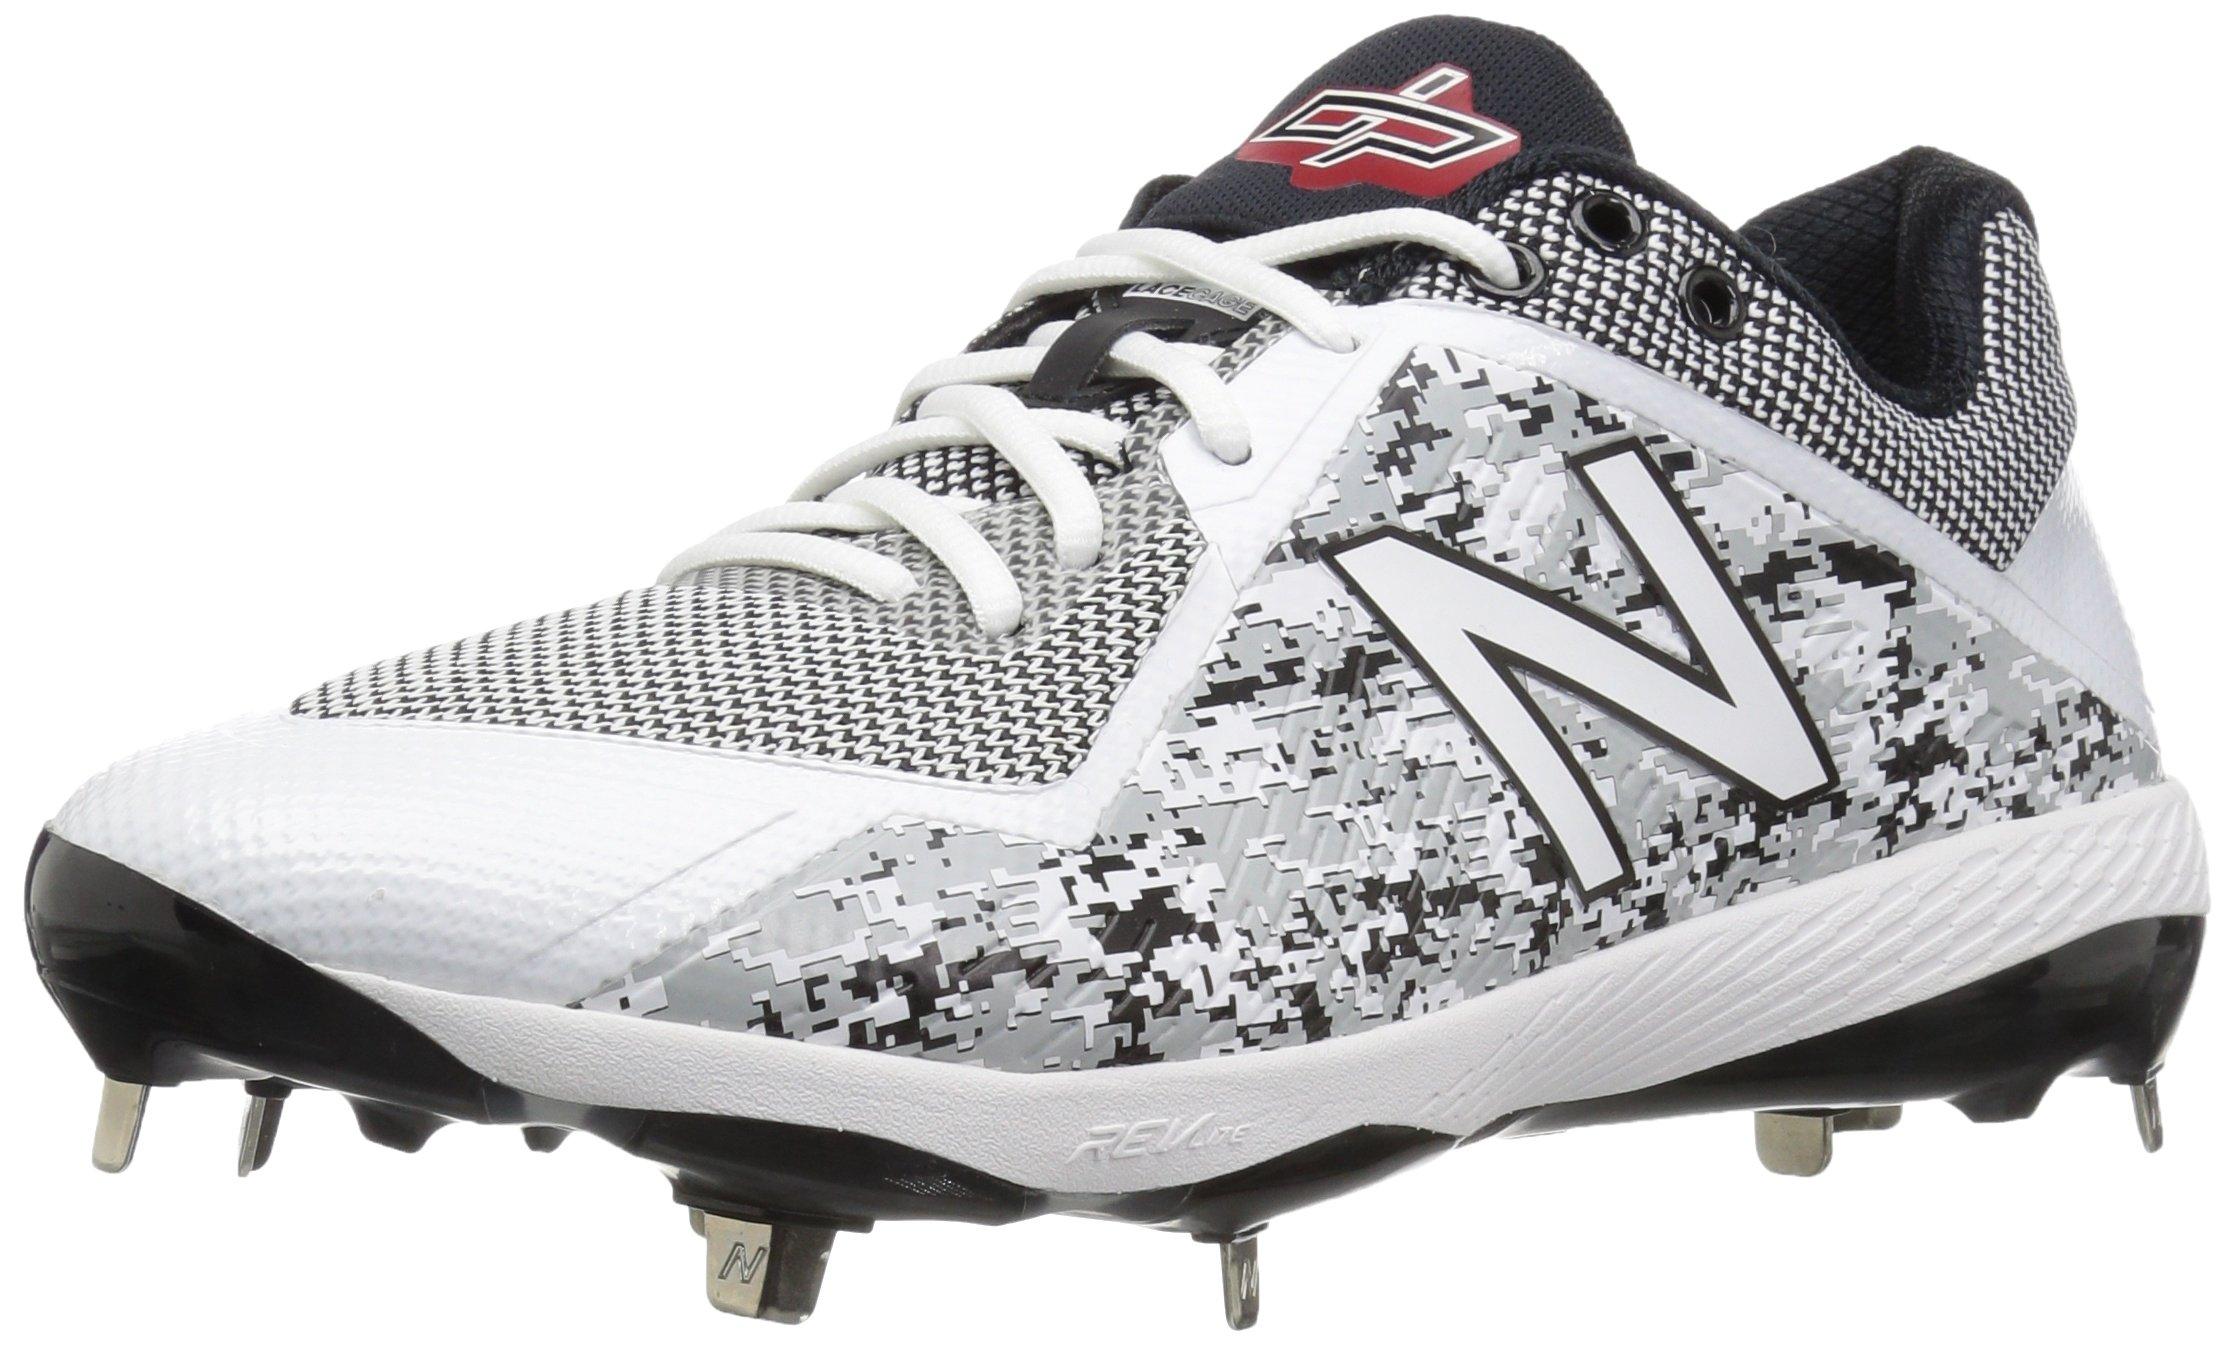 New Balance Men's L4040v4 Metal Baseball Shoe, Silver/Camo, 7.5 2E US by New Balance (Image #1)